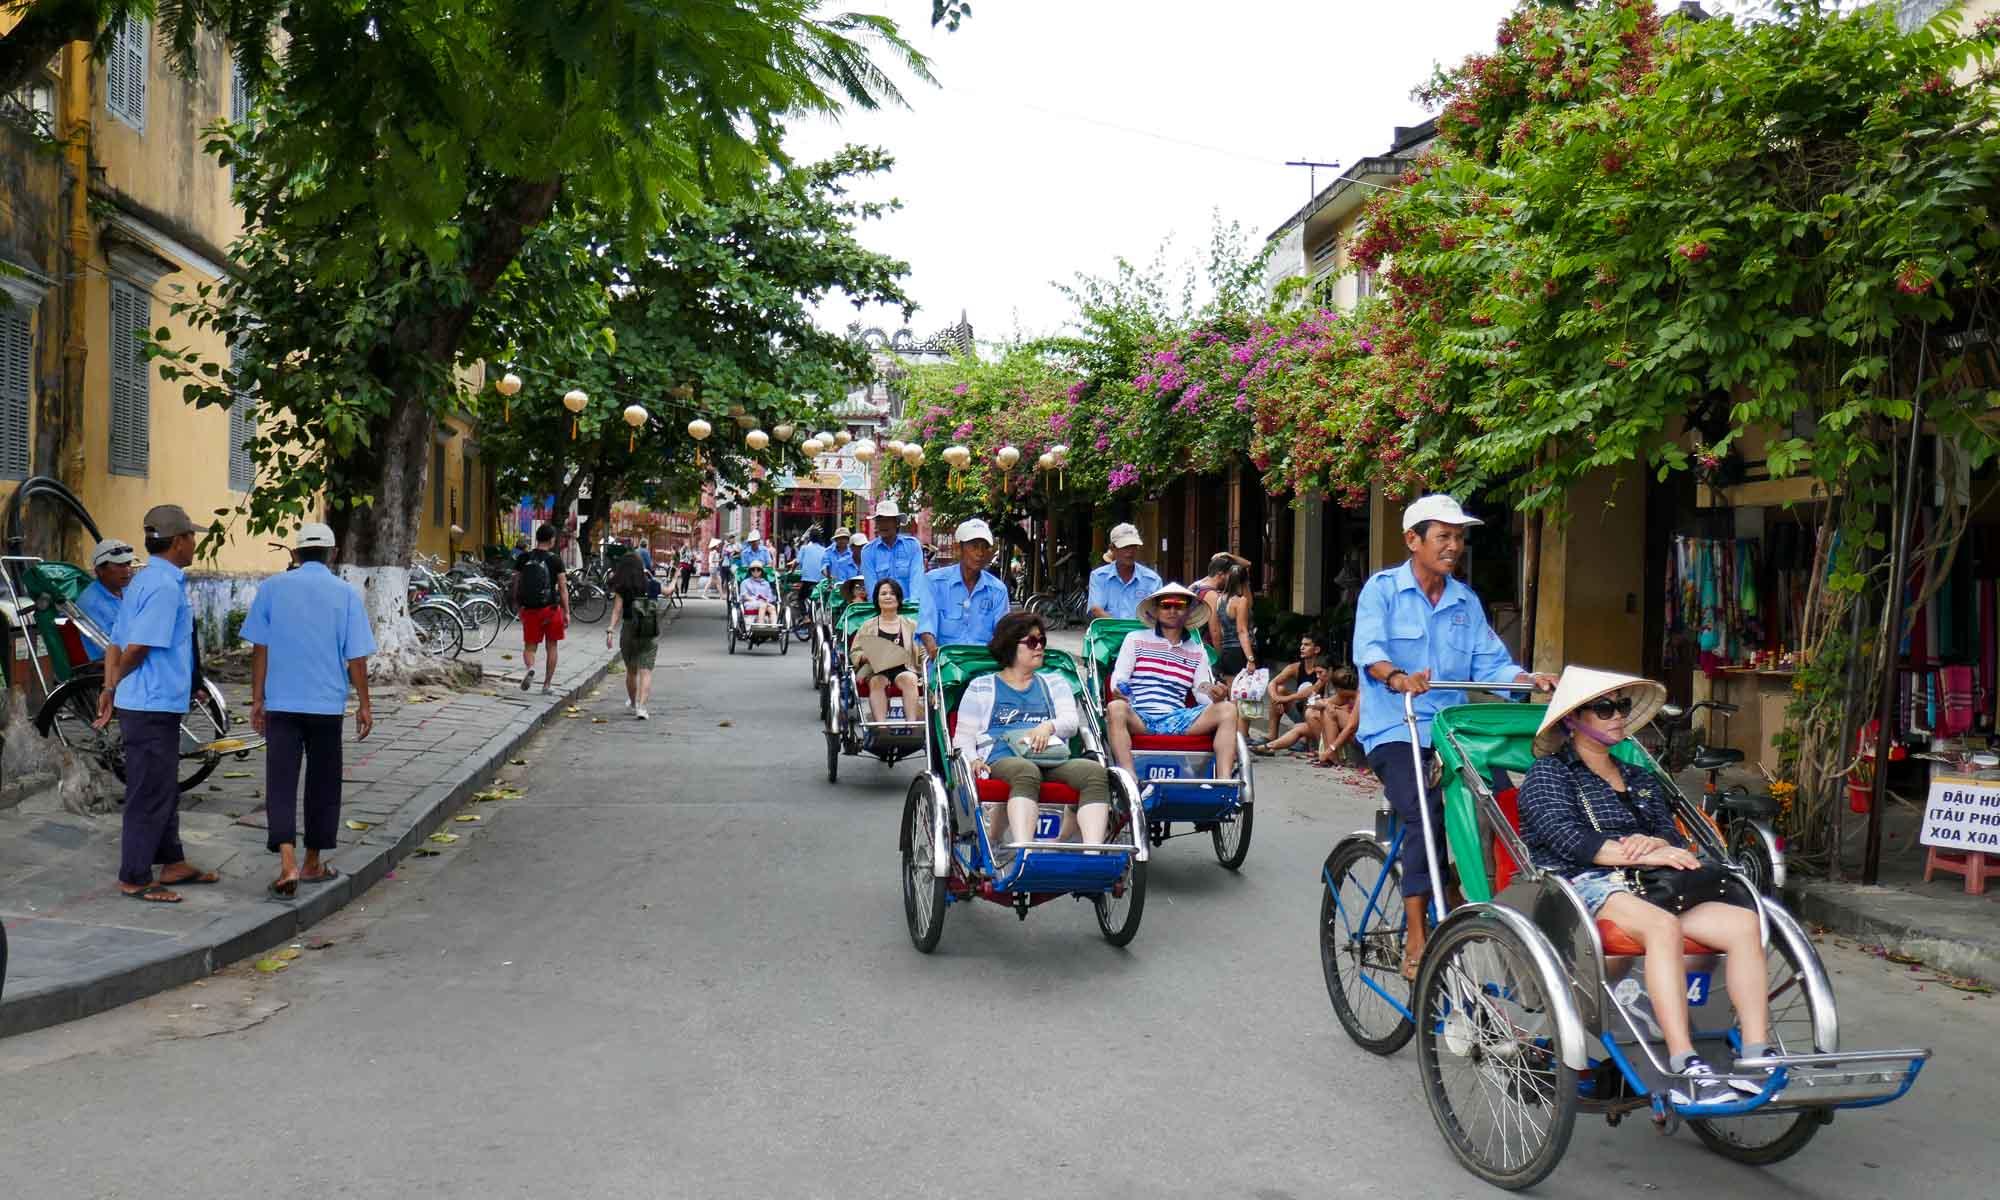 Tourist group on rickshaws in Old Town